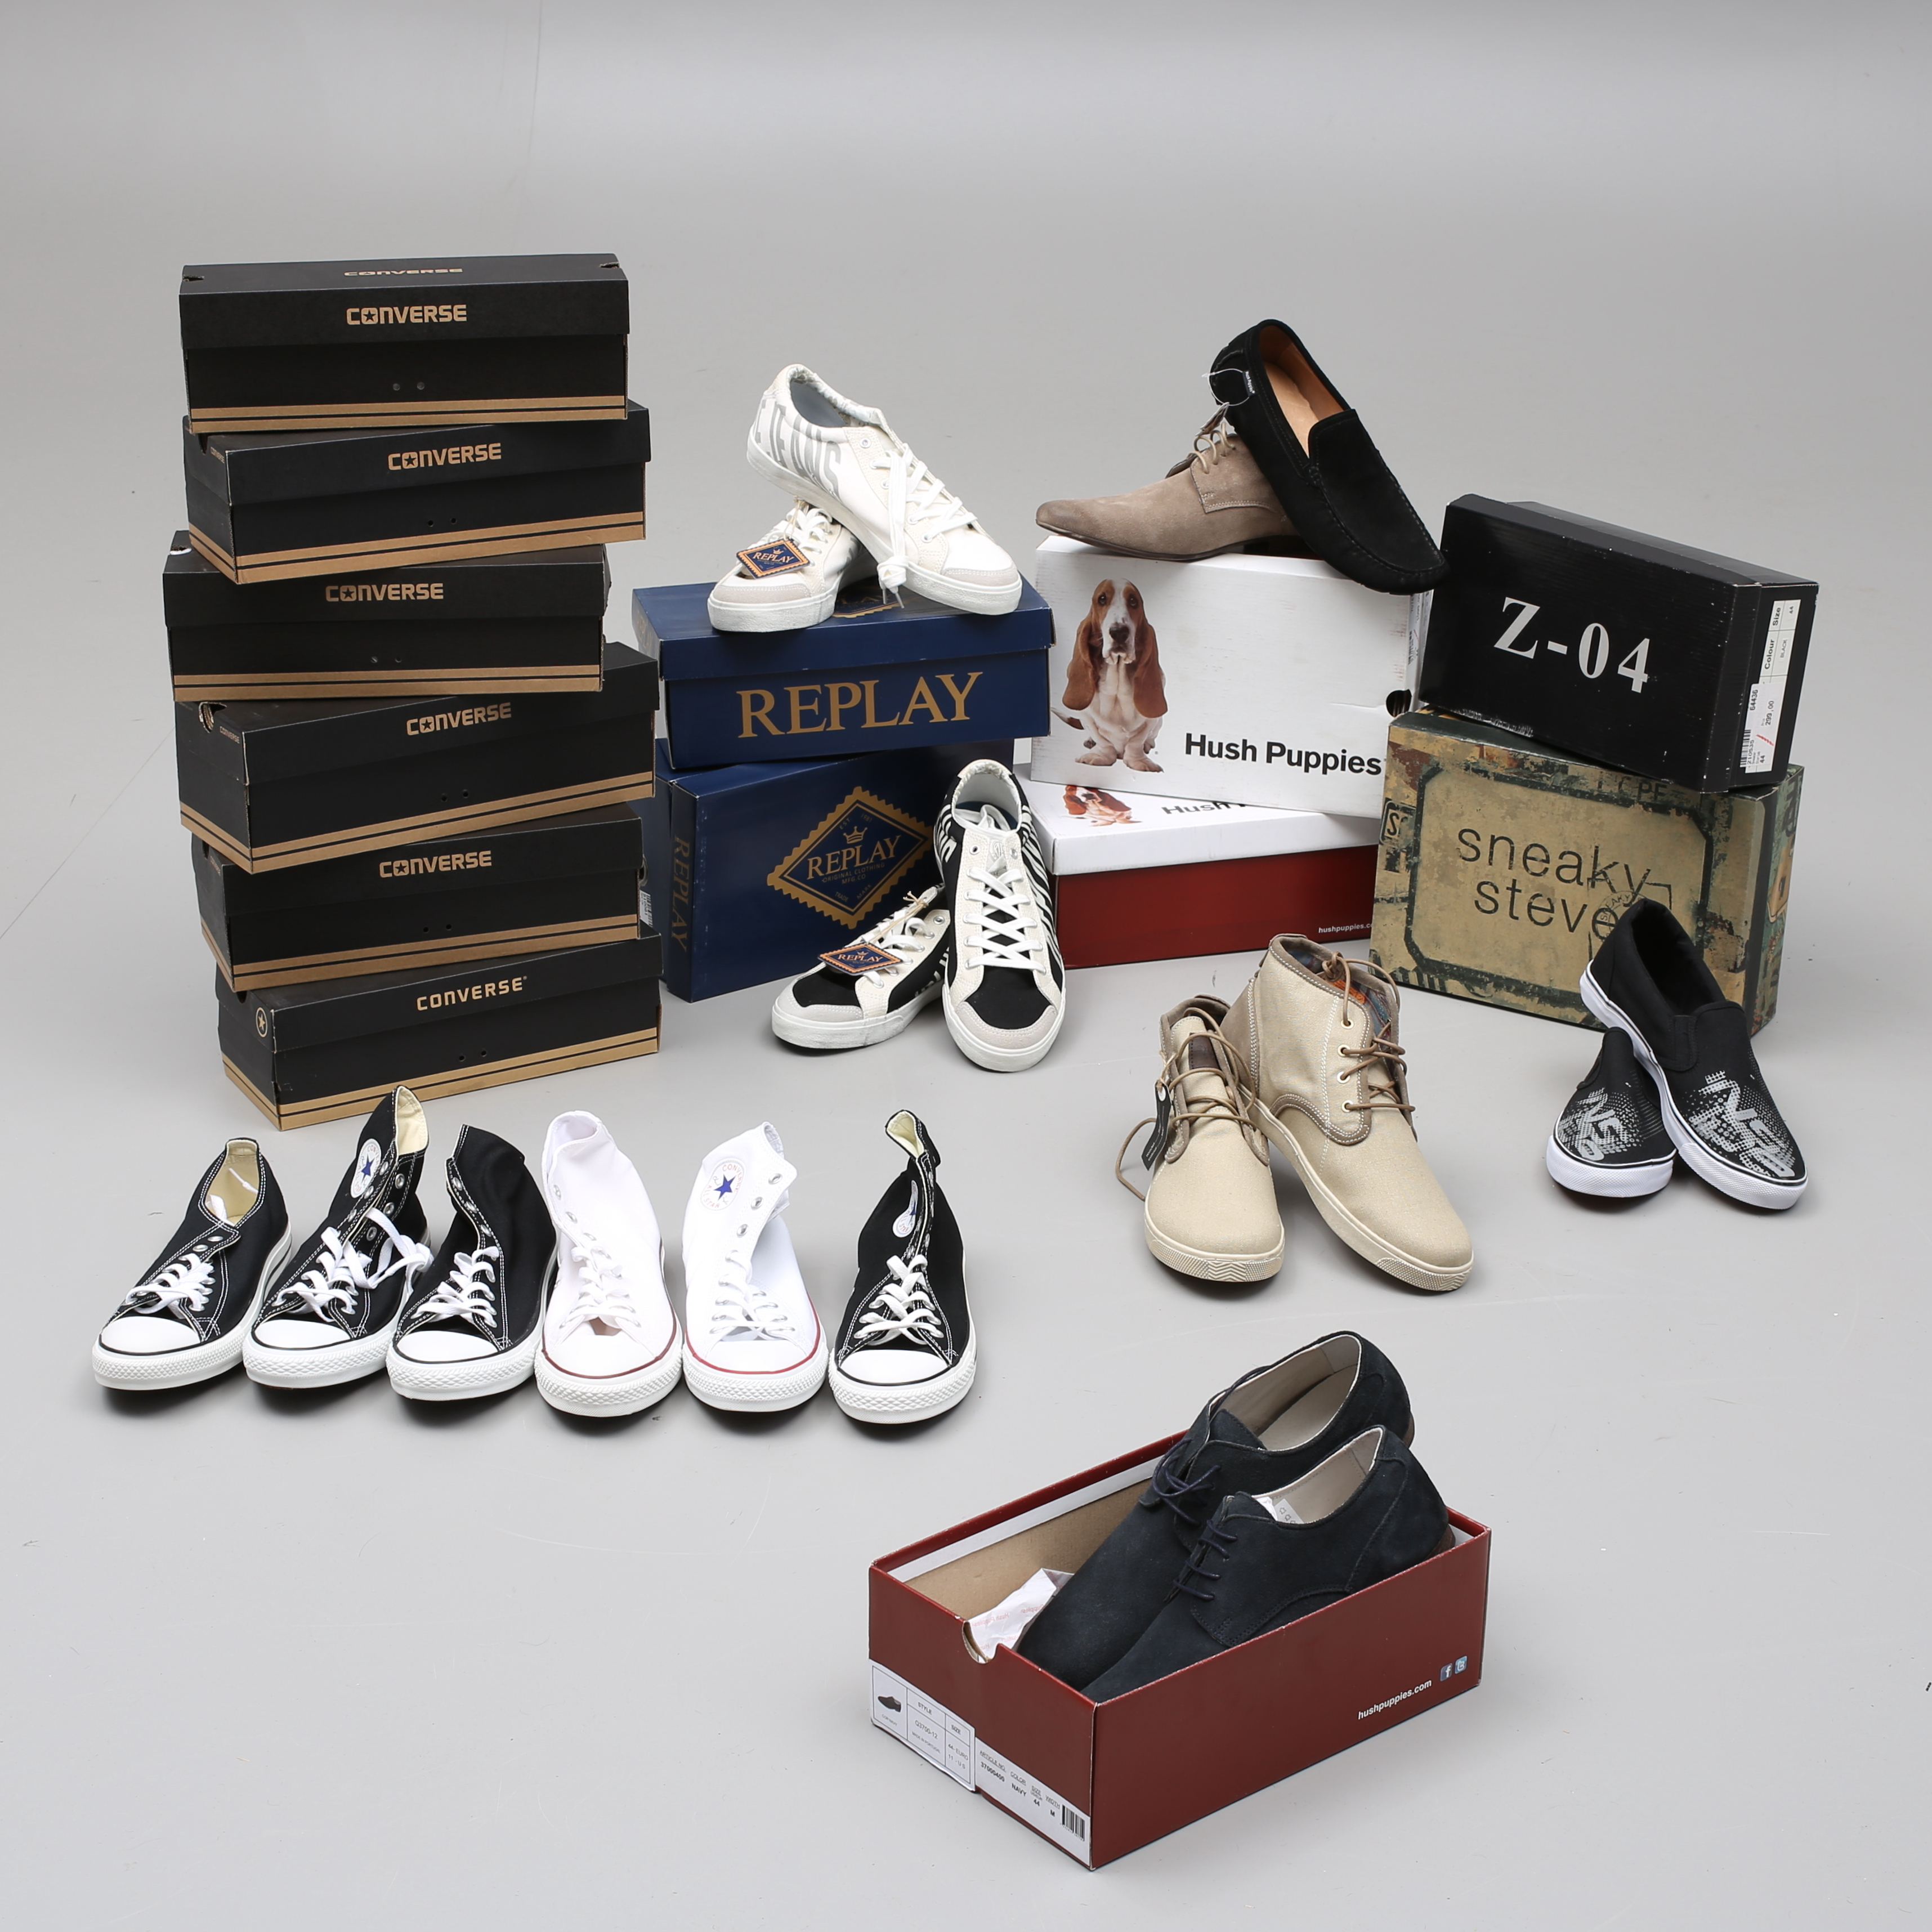 2e00c3e6517 HERRSKOR, 13 par, storlek 44, Replay, Hush Puppies, Converse m m. Vintage  clothing & Accessories - Auctionet